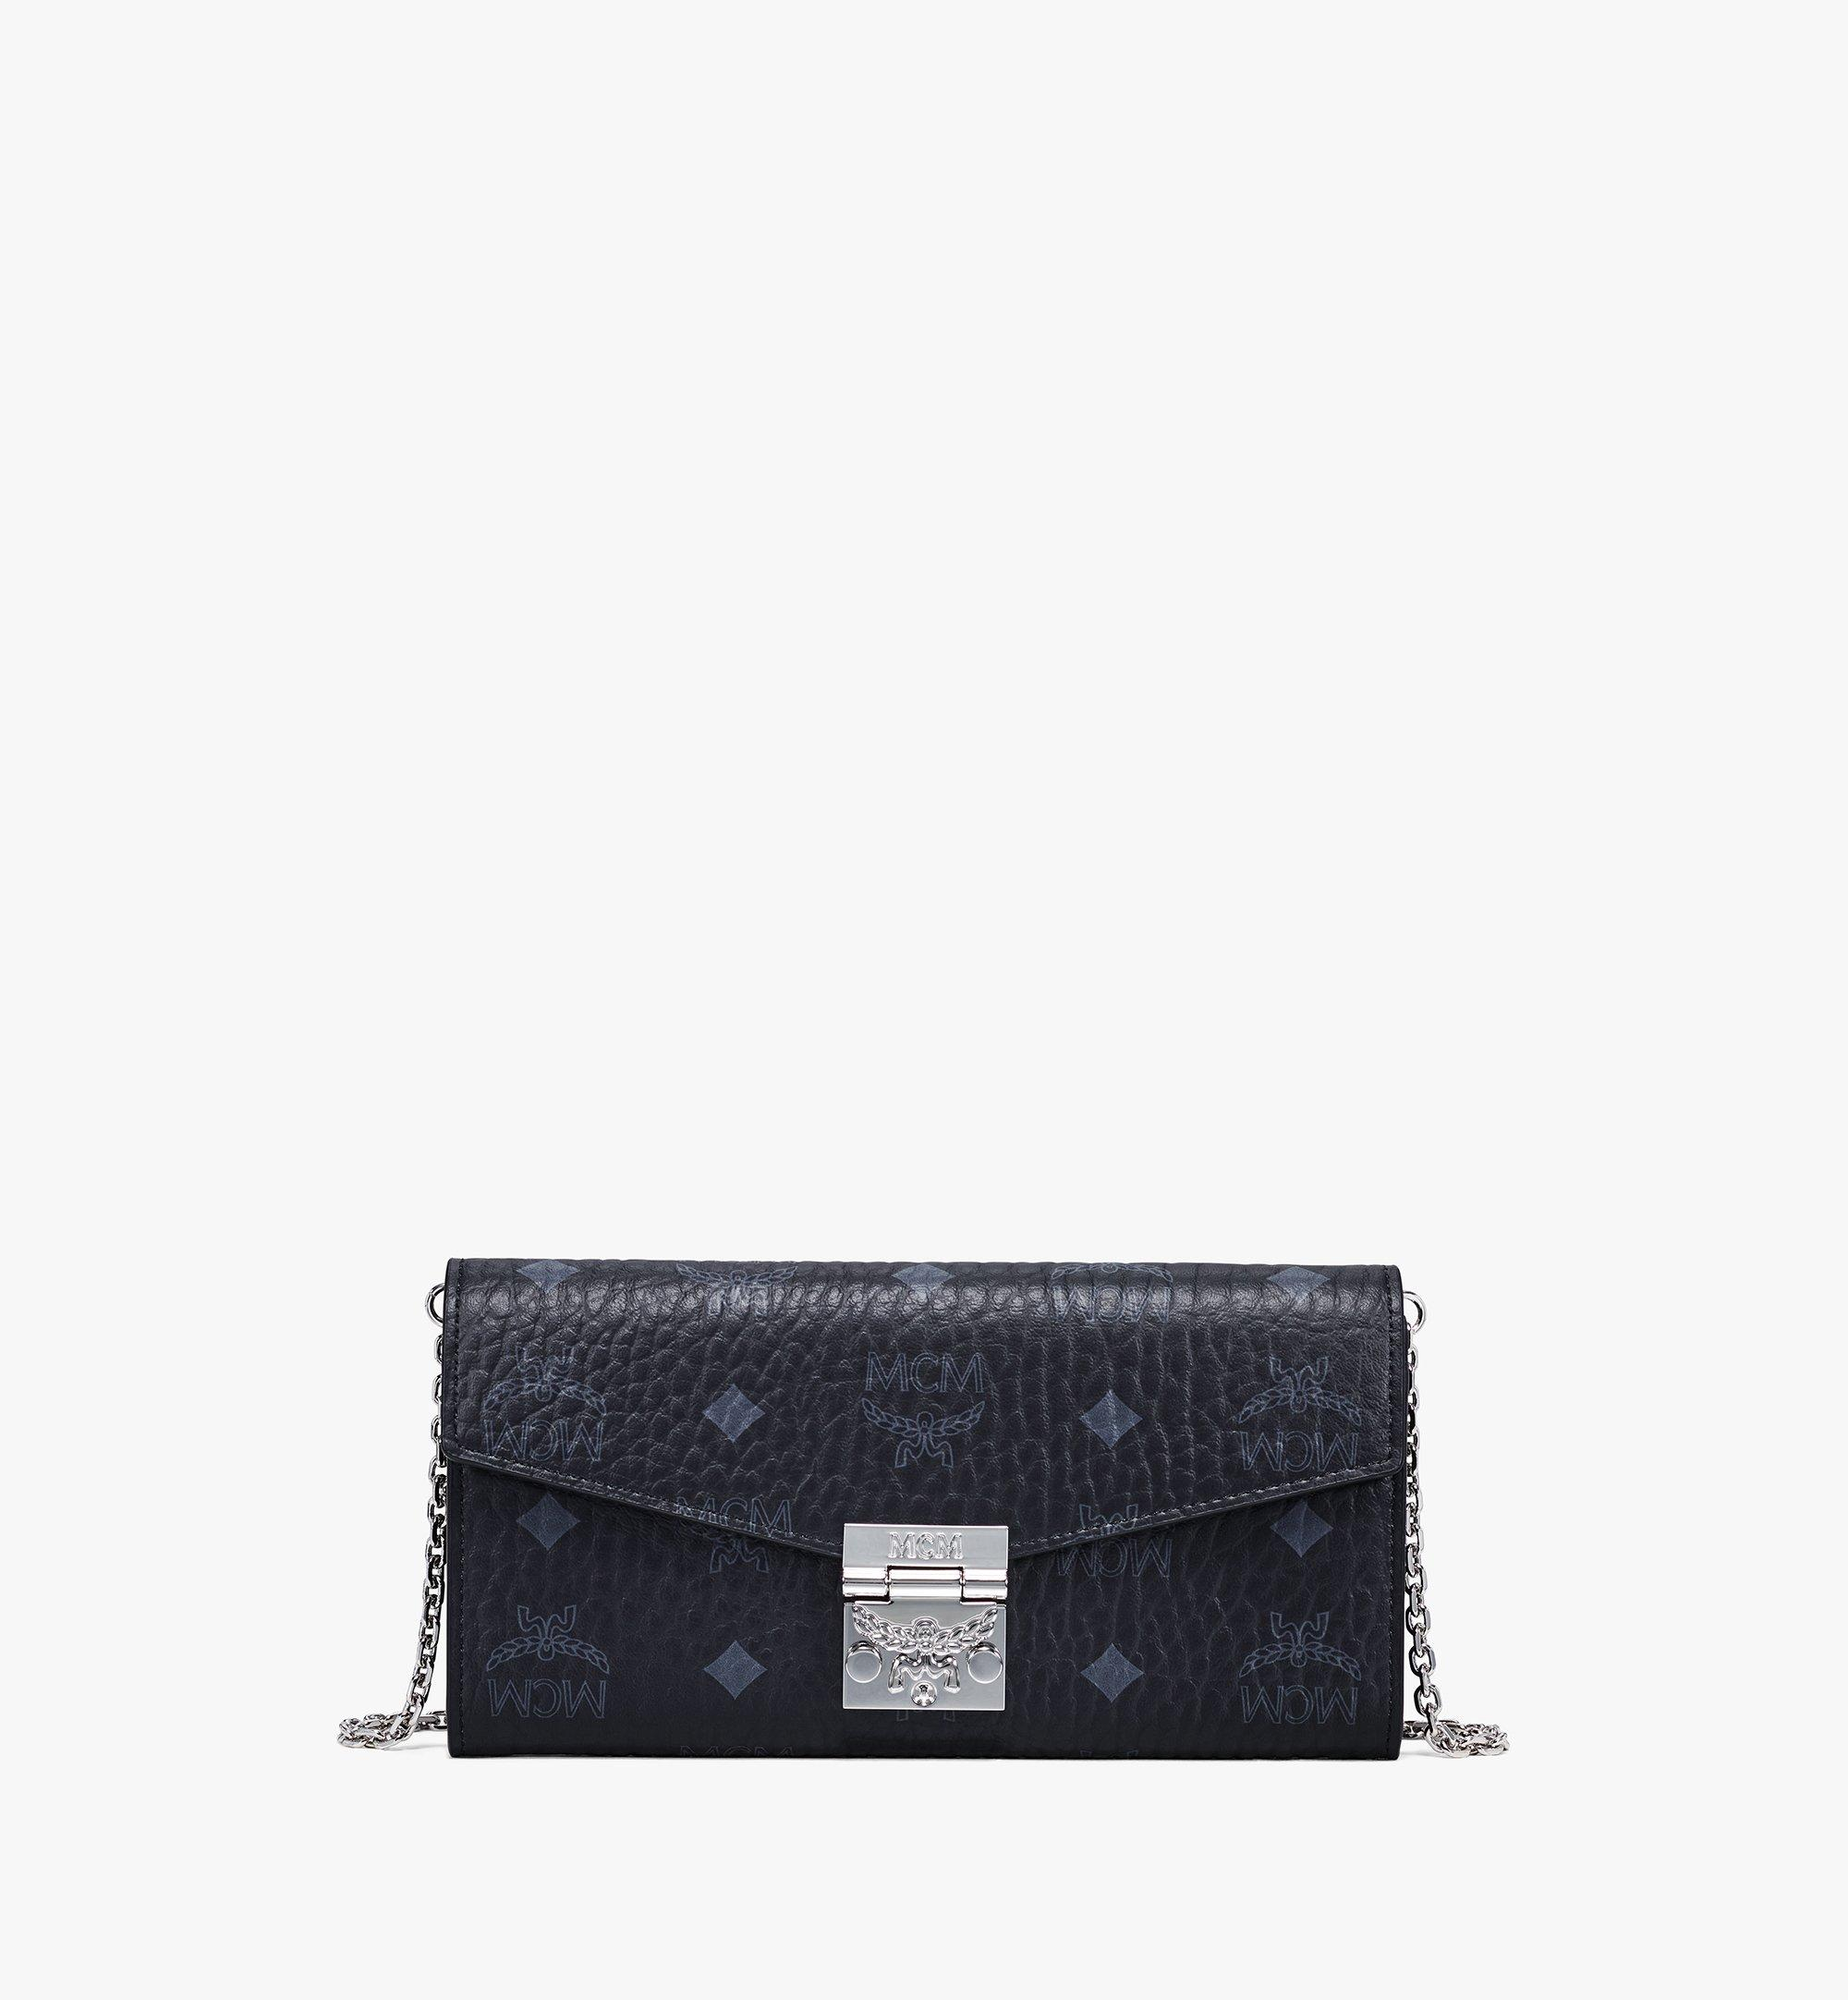 MCM Tasche Patricia Visetos Crossbody Wallet Large Black in schwarz